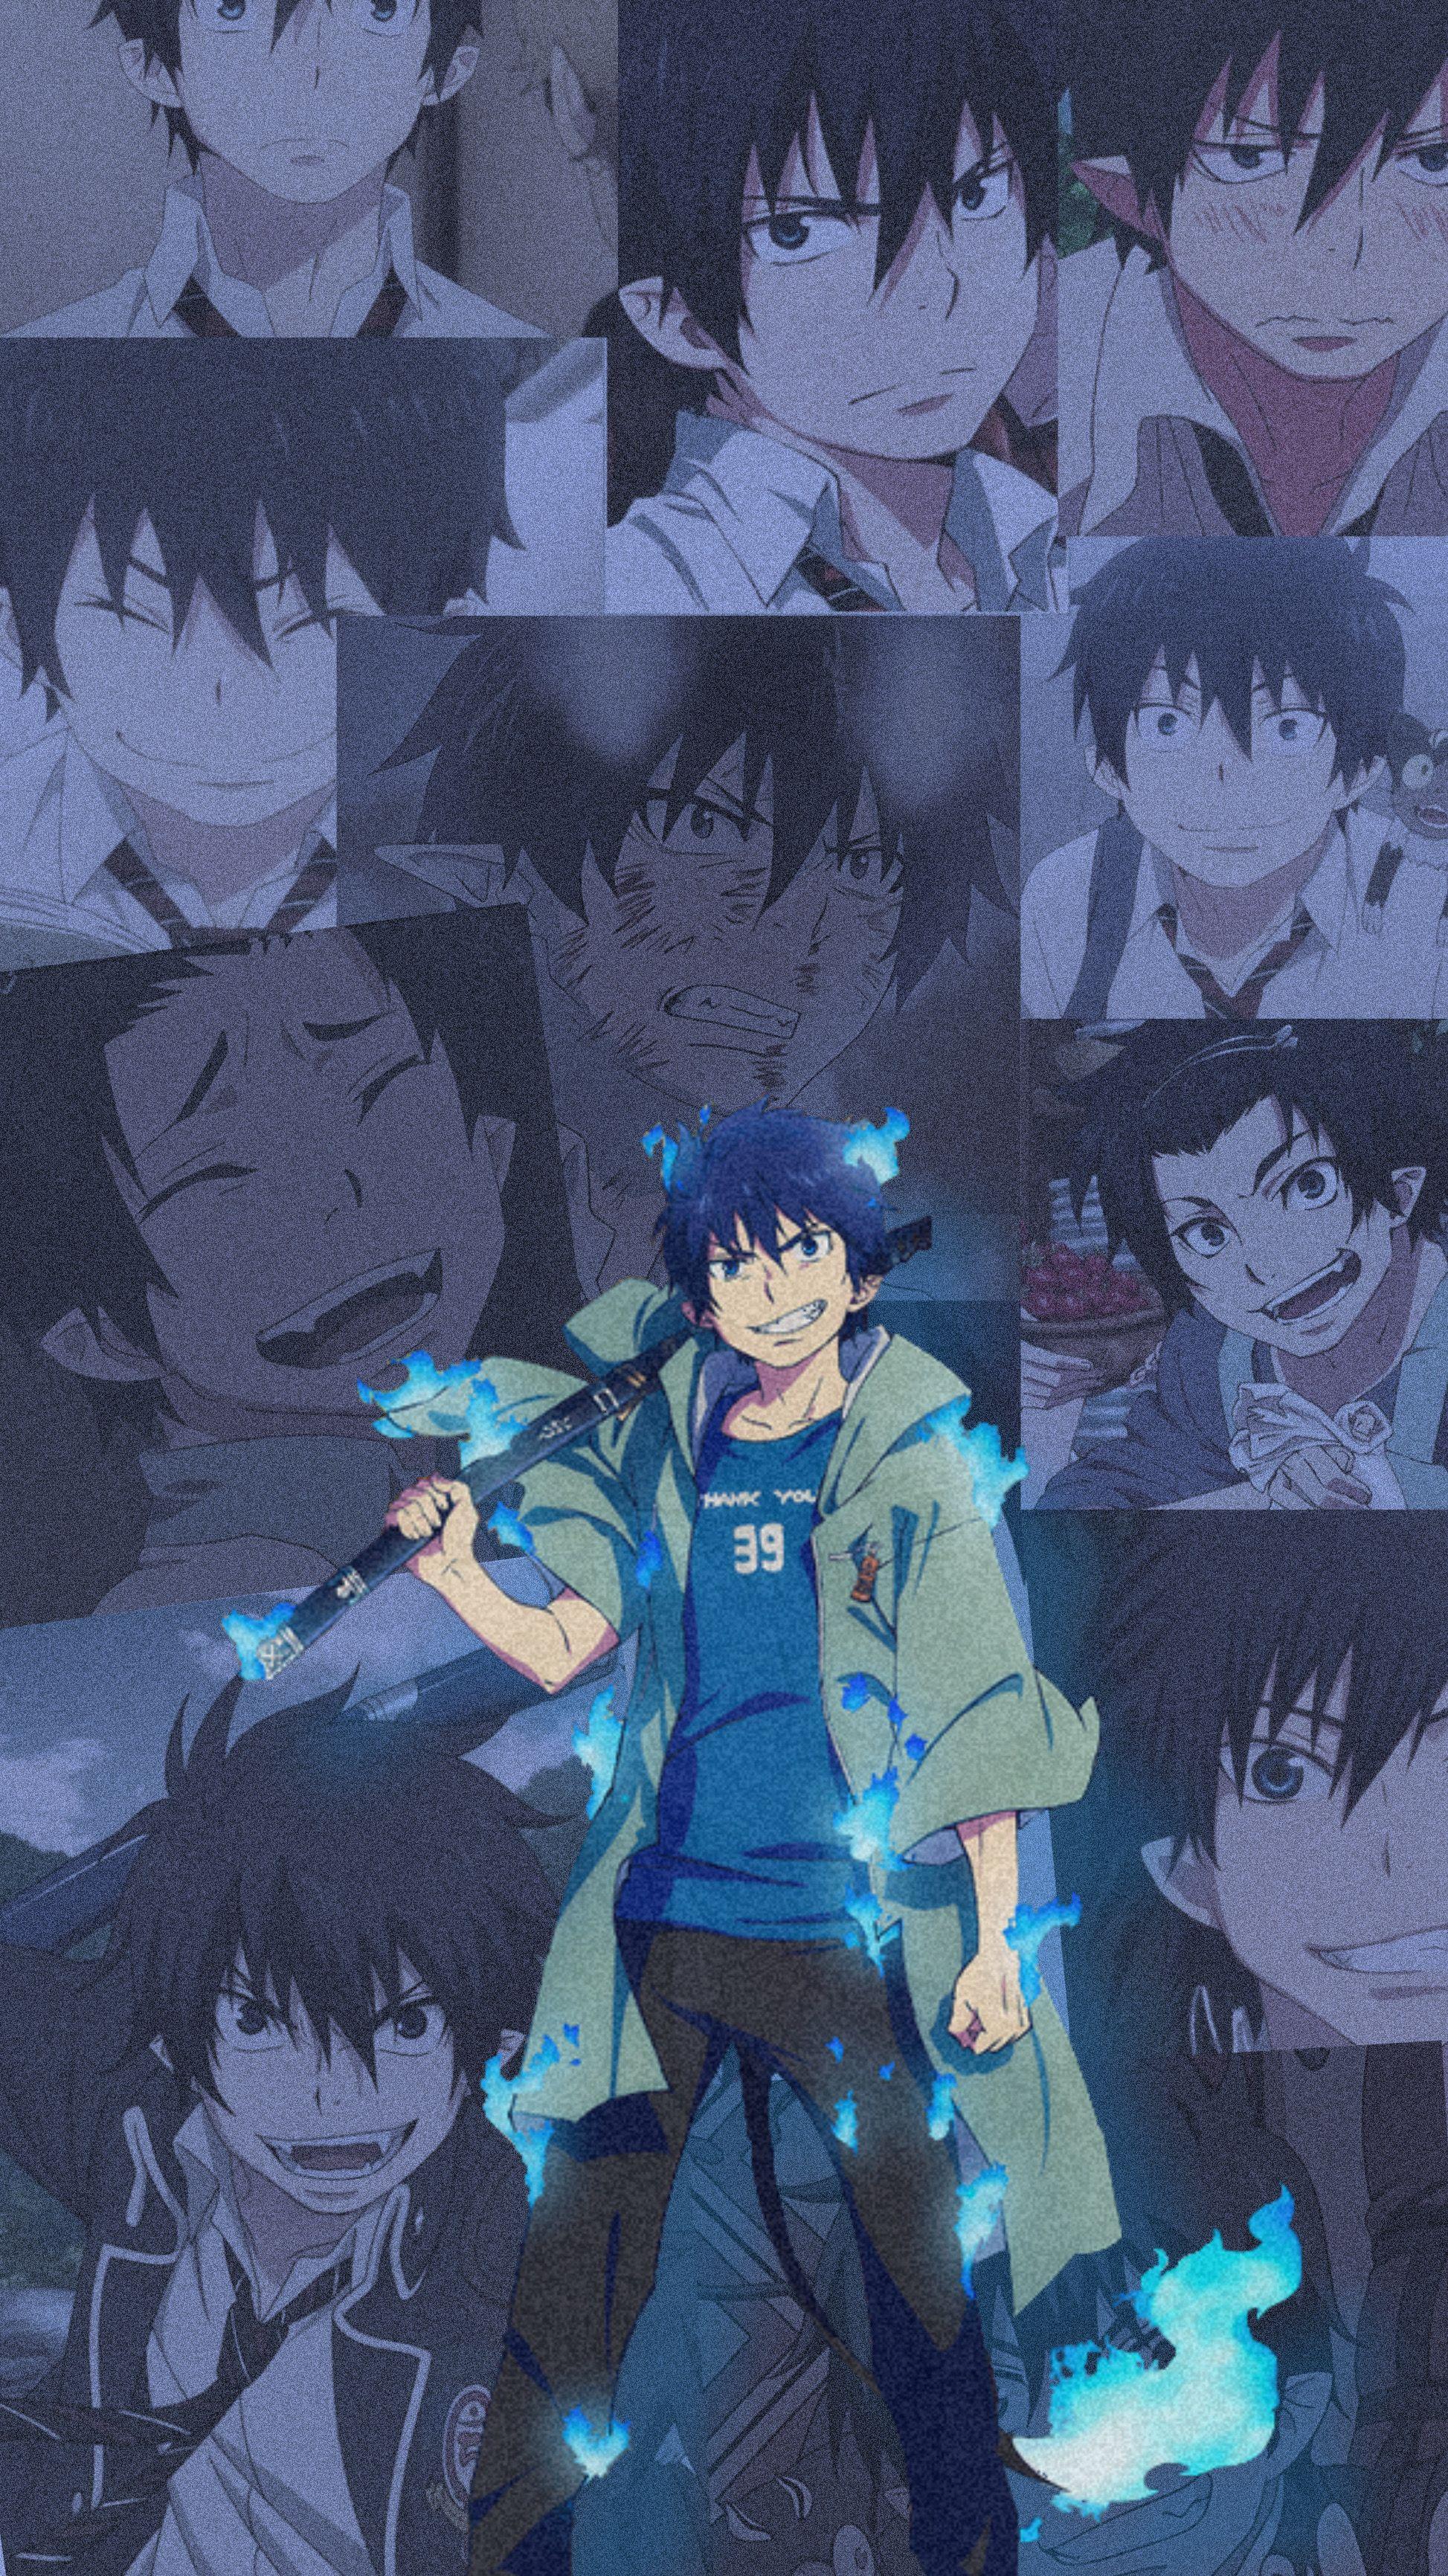 Rin Okumara 4 Blue Exorcist Rin Blue Exorcist Anime Cute Cartoon Wallpapers